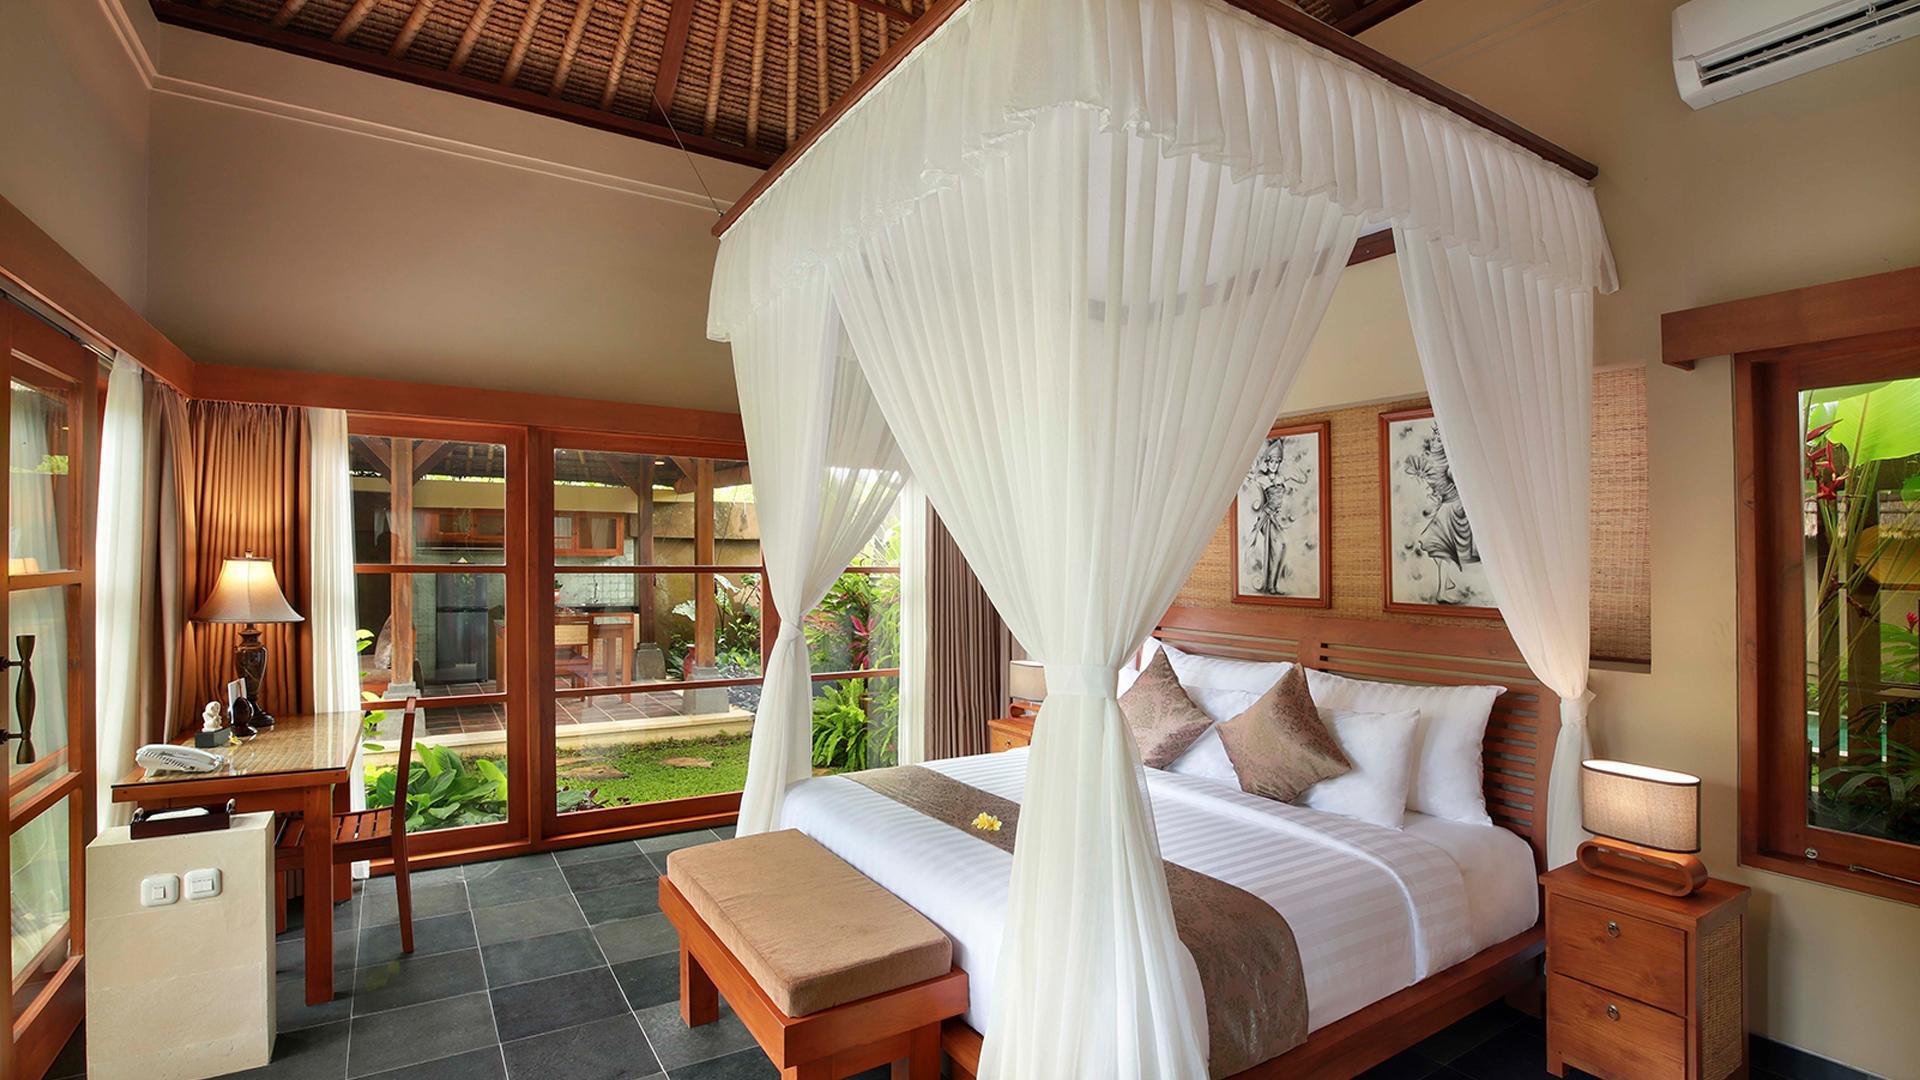 One-Bedroom Deluxe Pool Villa image 1 at Ubud Nyuh Bali Resort & Spa - Older by Kabupaten Gianyar, Bali, Indonesia